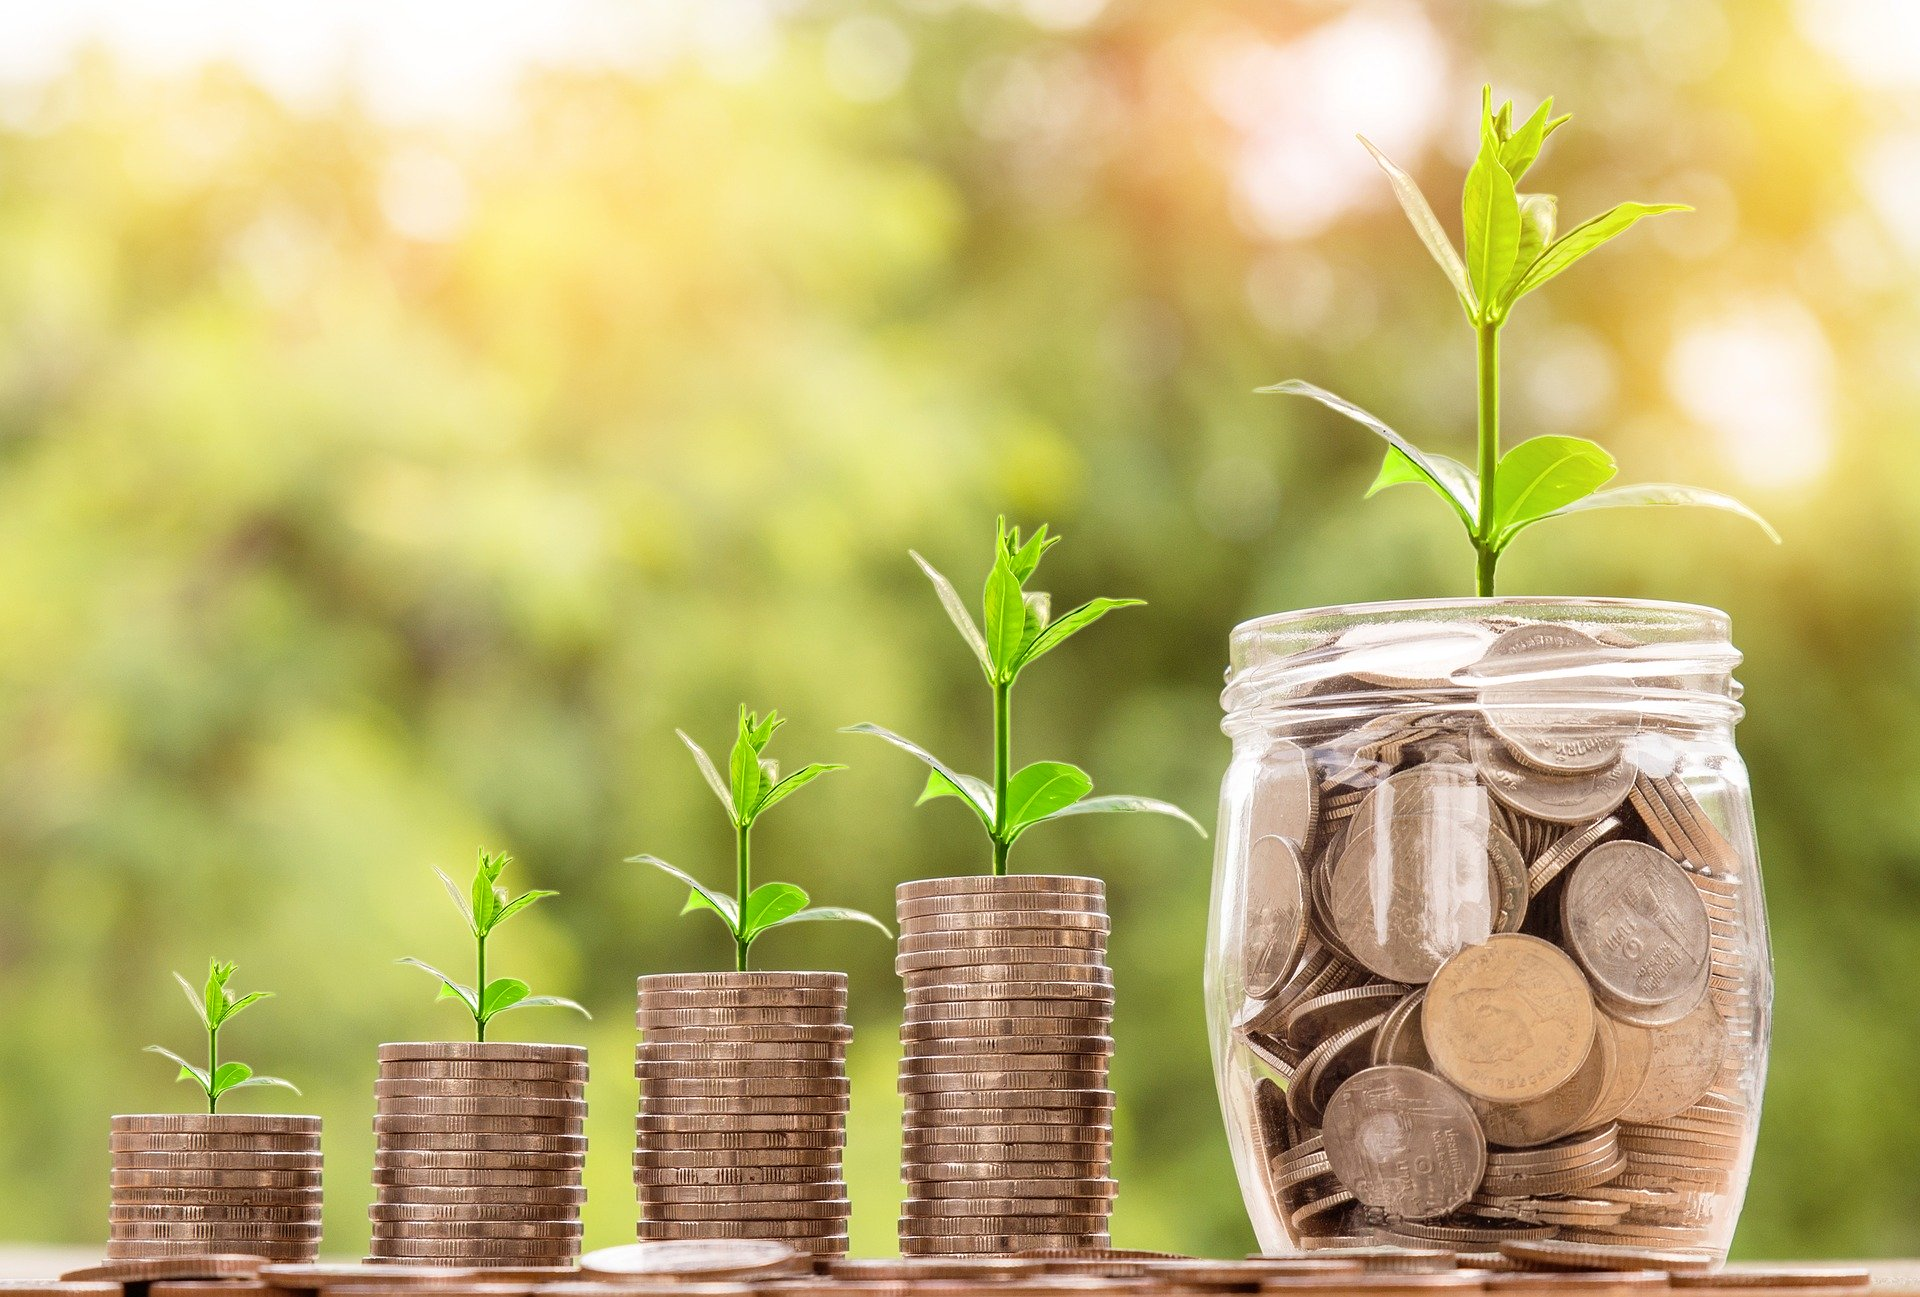 МаргаритаСкарлыгина:Инвестиции помогают развивать территорию